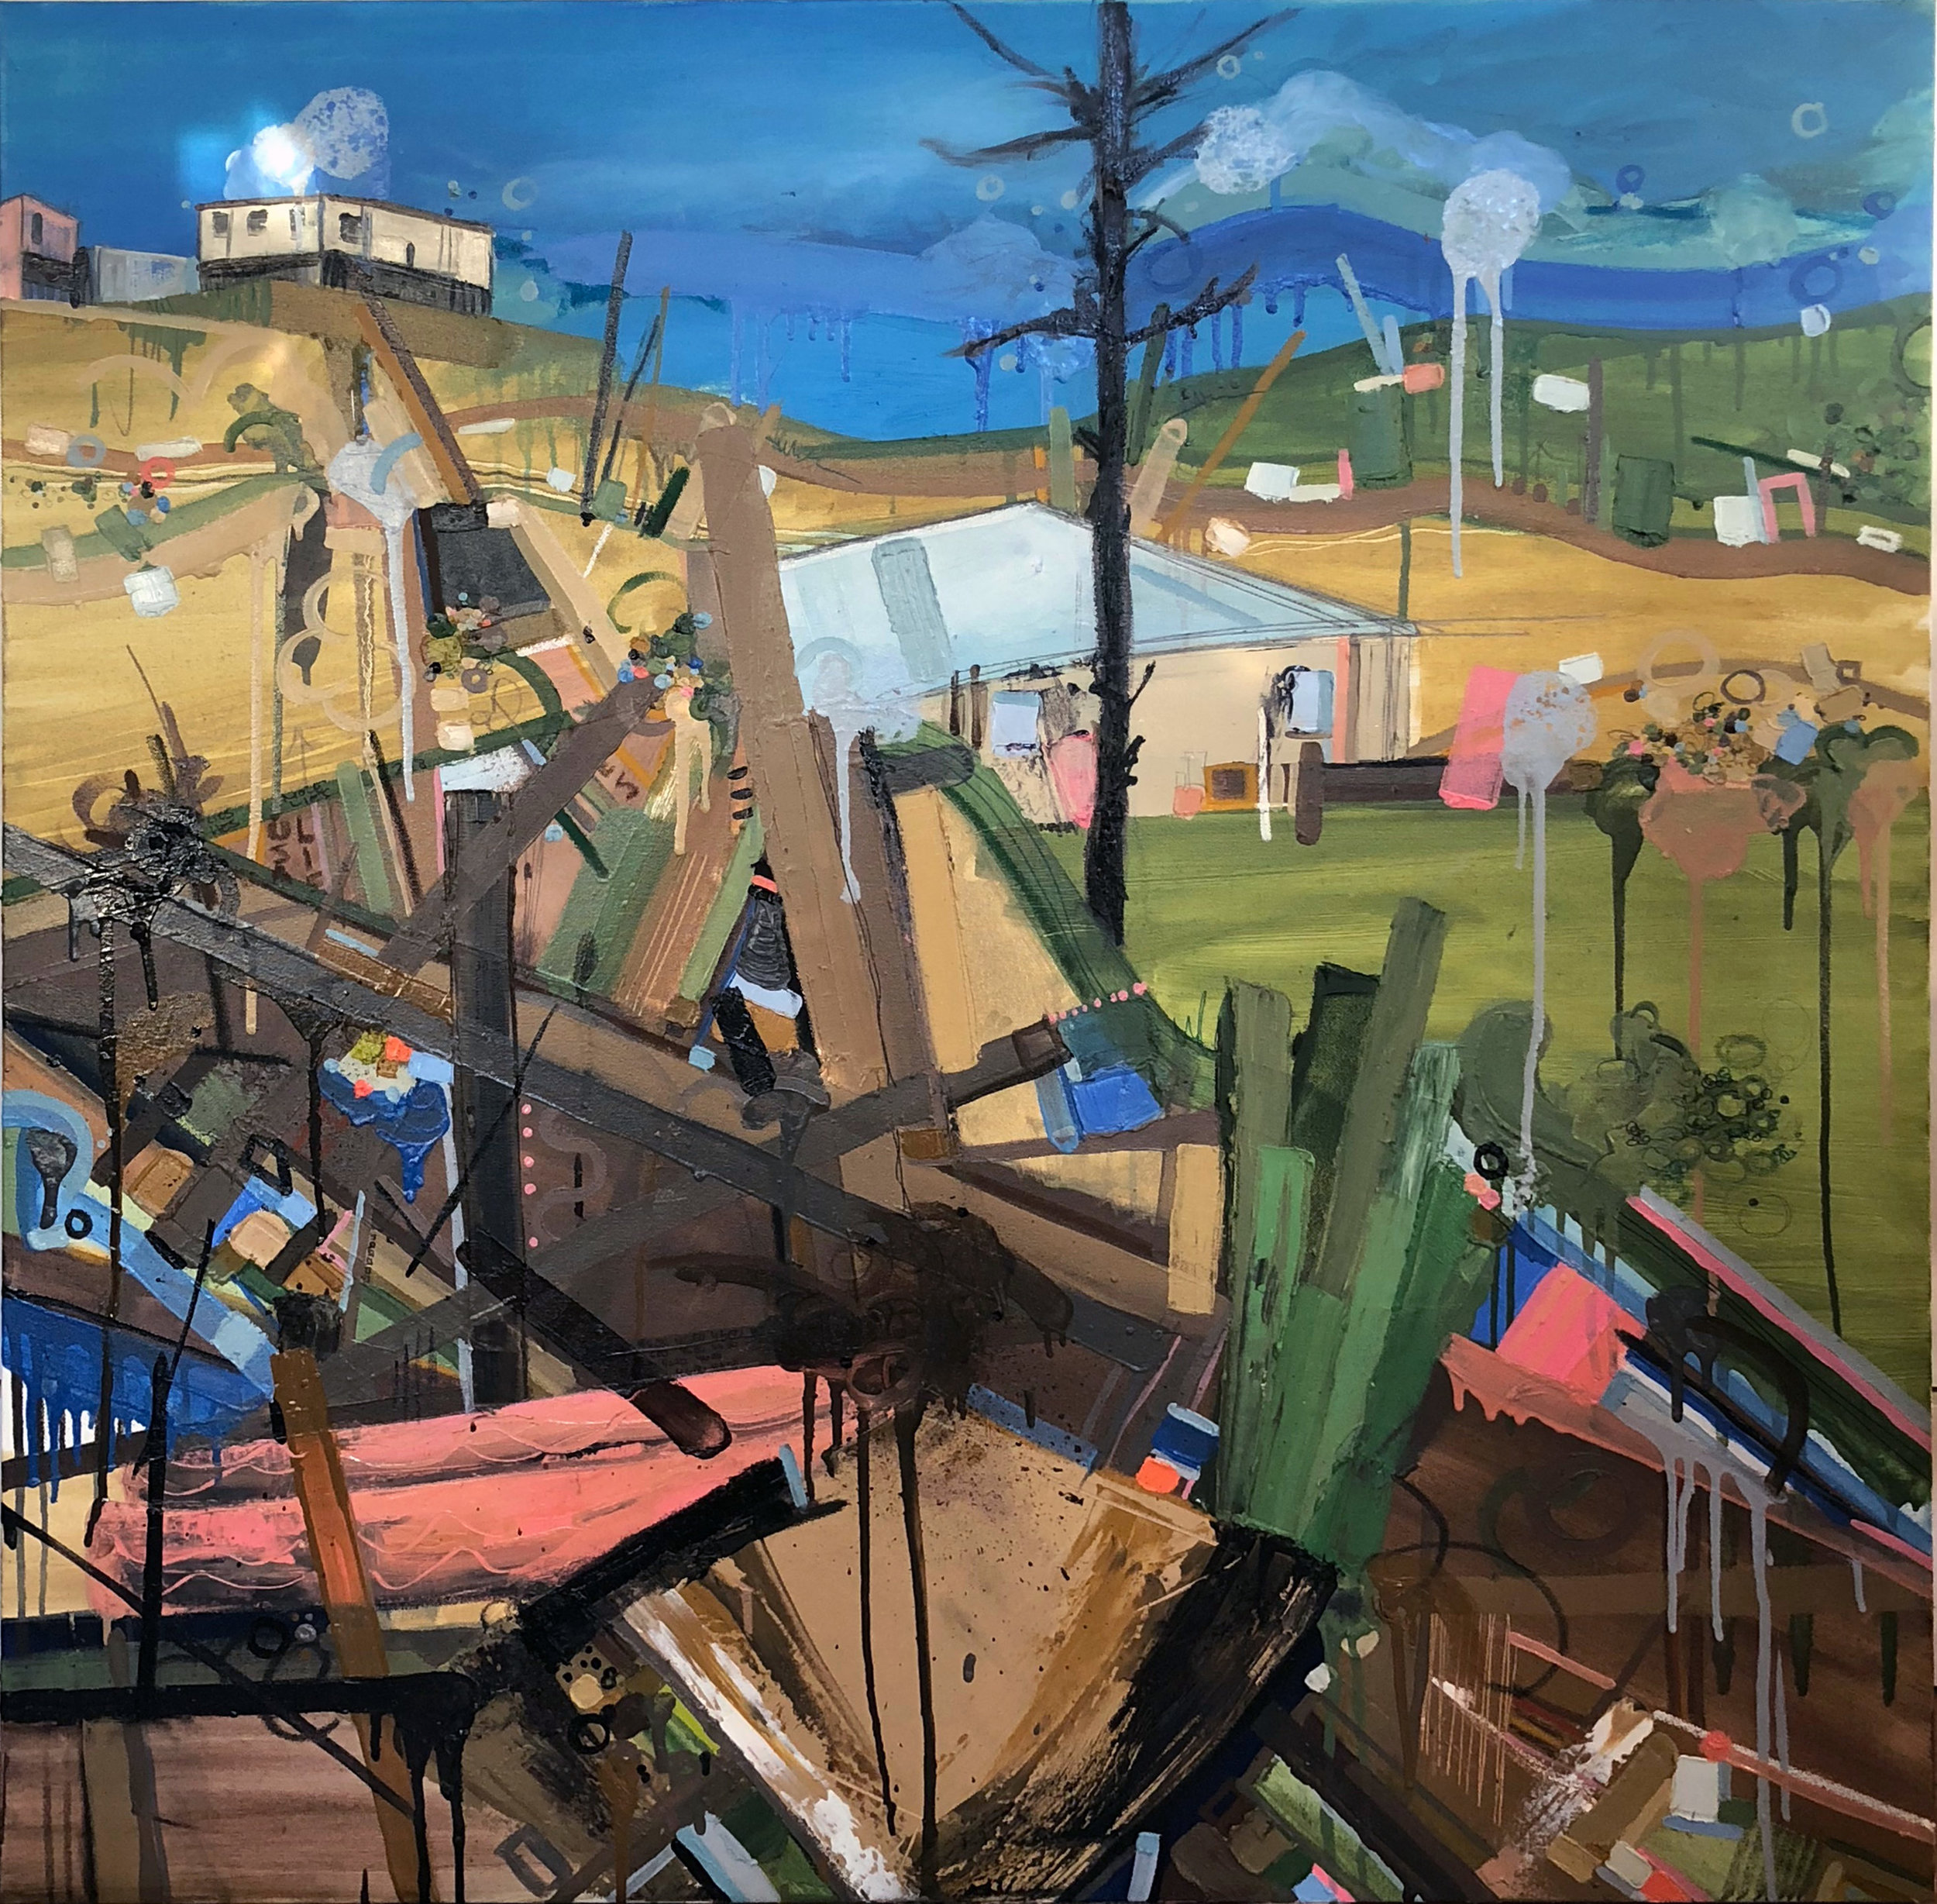 Rico, 2018, Oil, Oil Pastel, Pencil, Marker on canvas, 40 x 40 inches